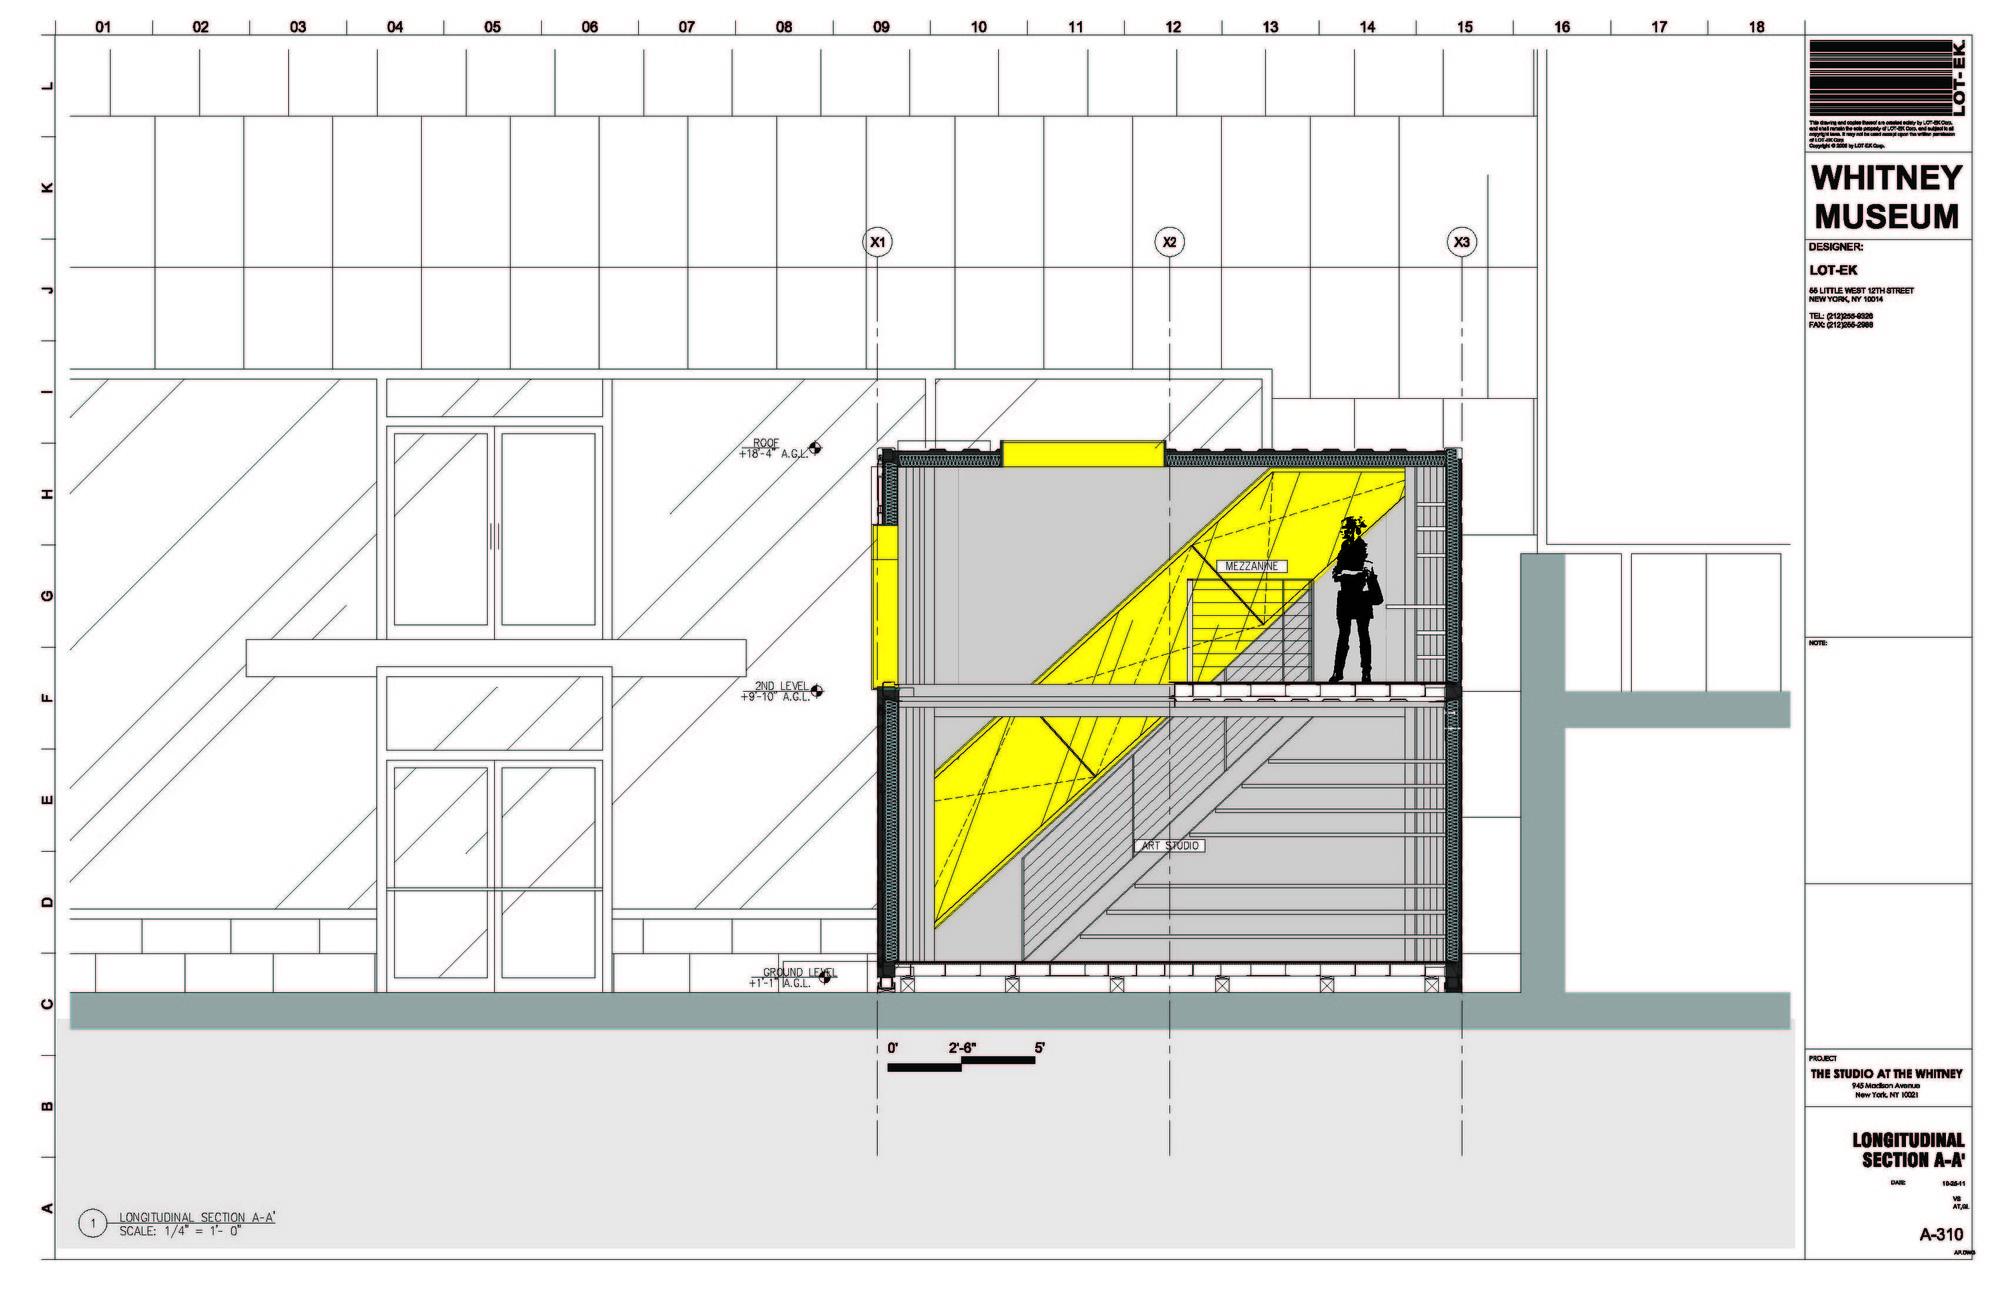 Gallery of whitney studio lot ek architecture design 11 for Studio 11 architecture